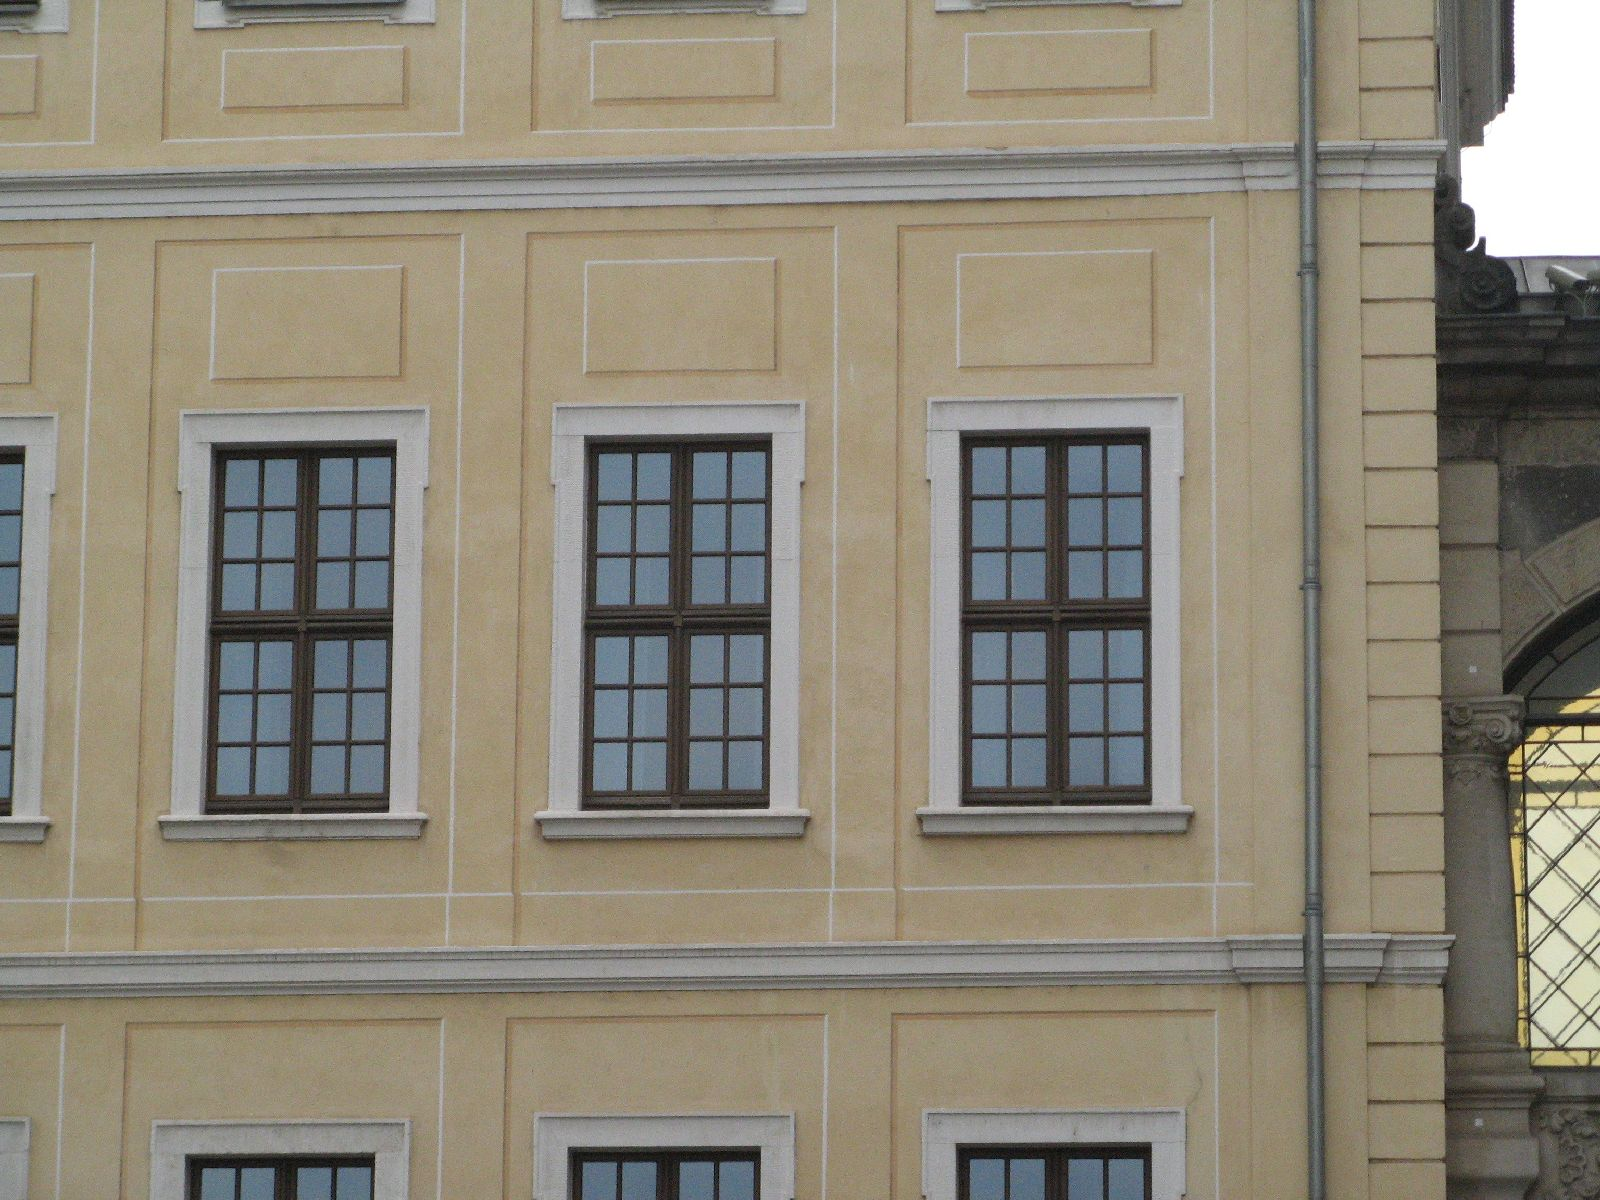 Building_Texture_B_3625